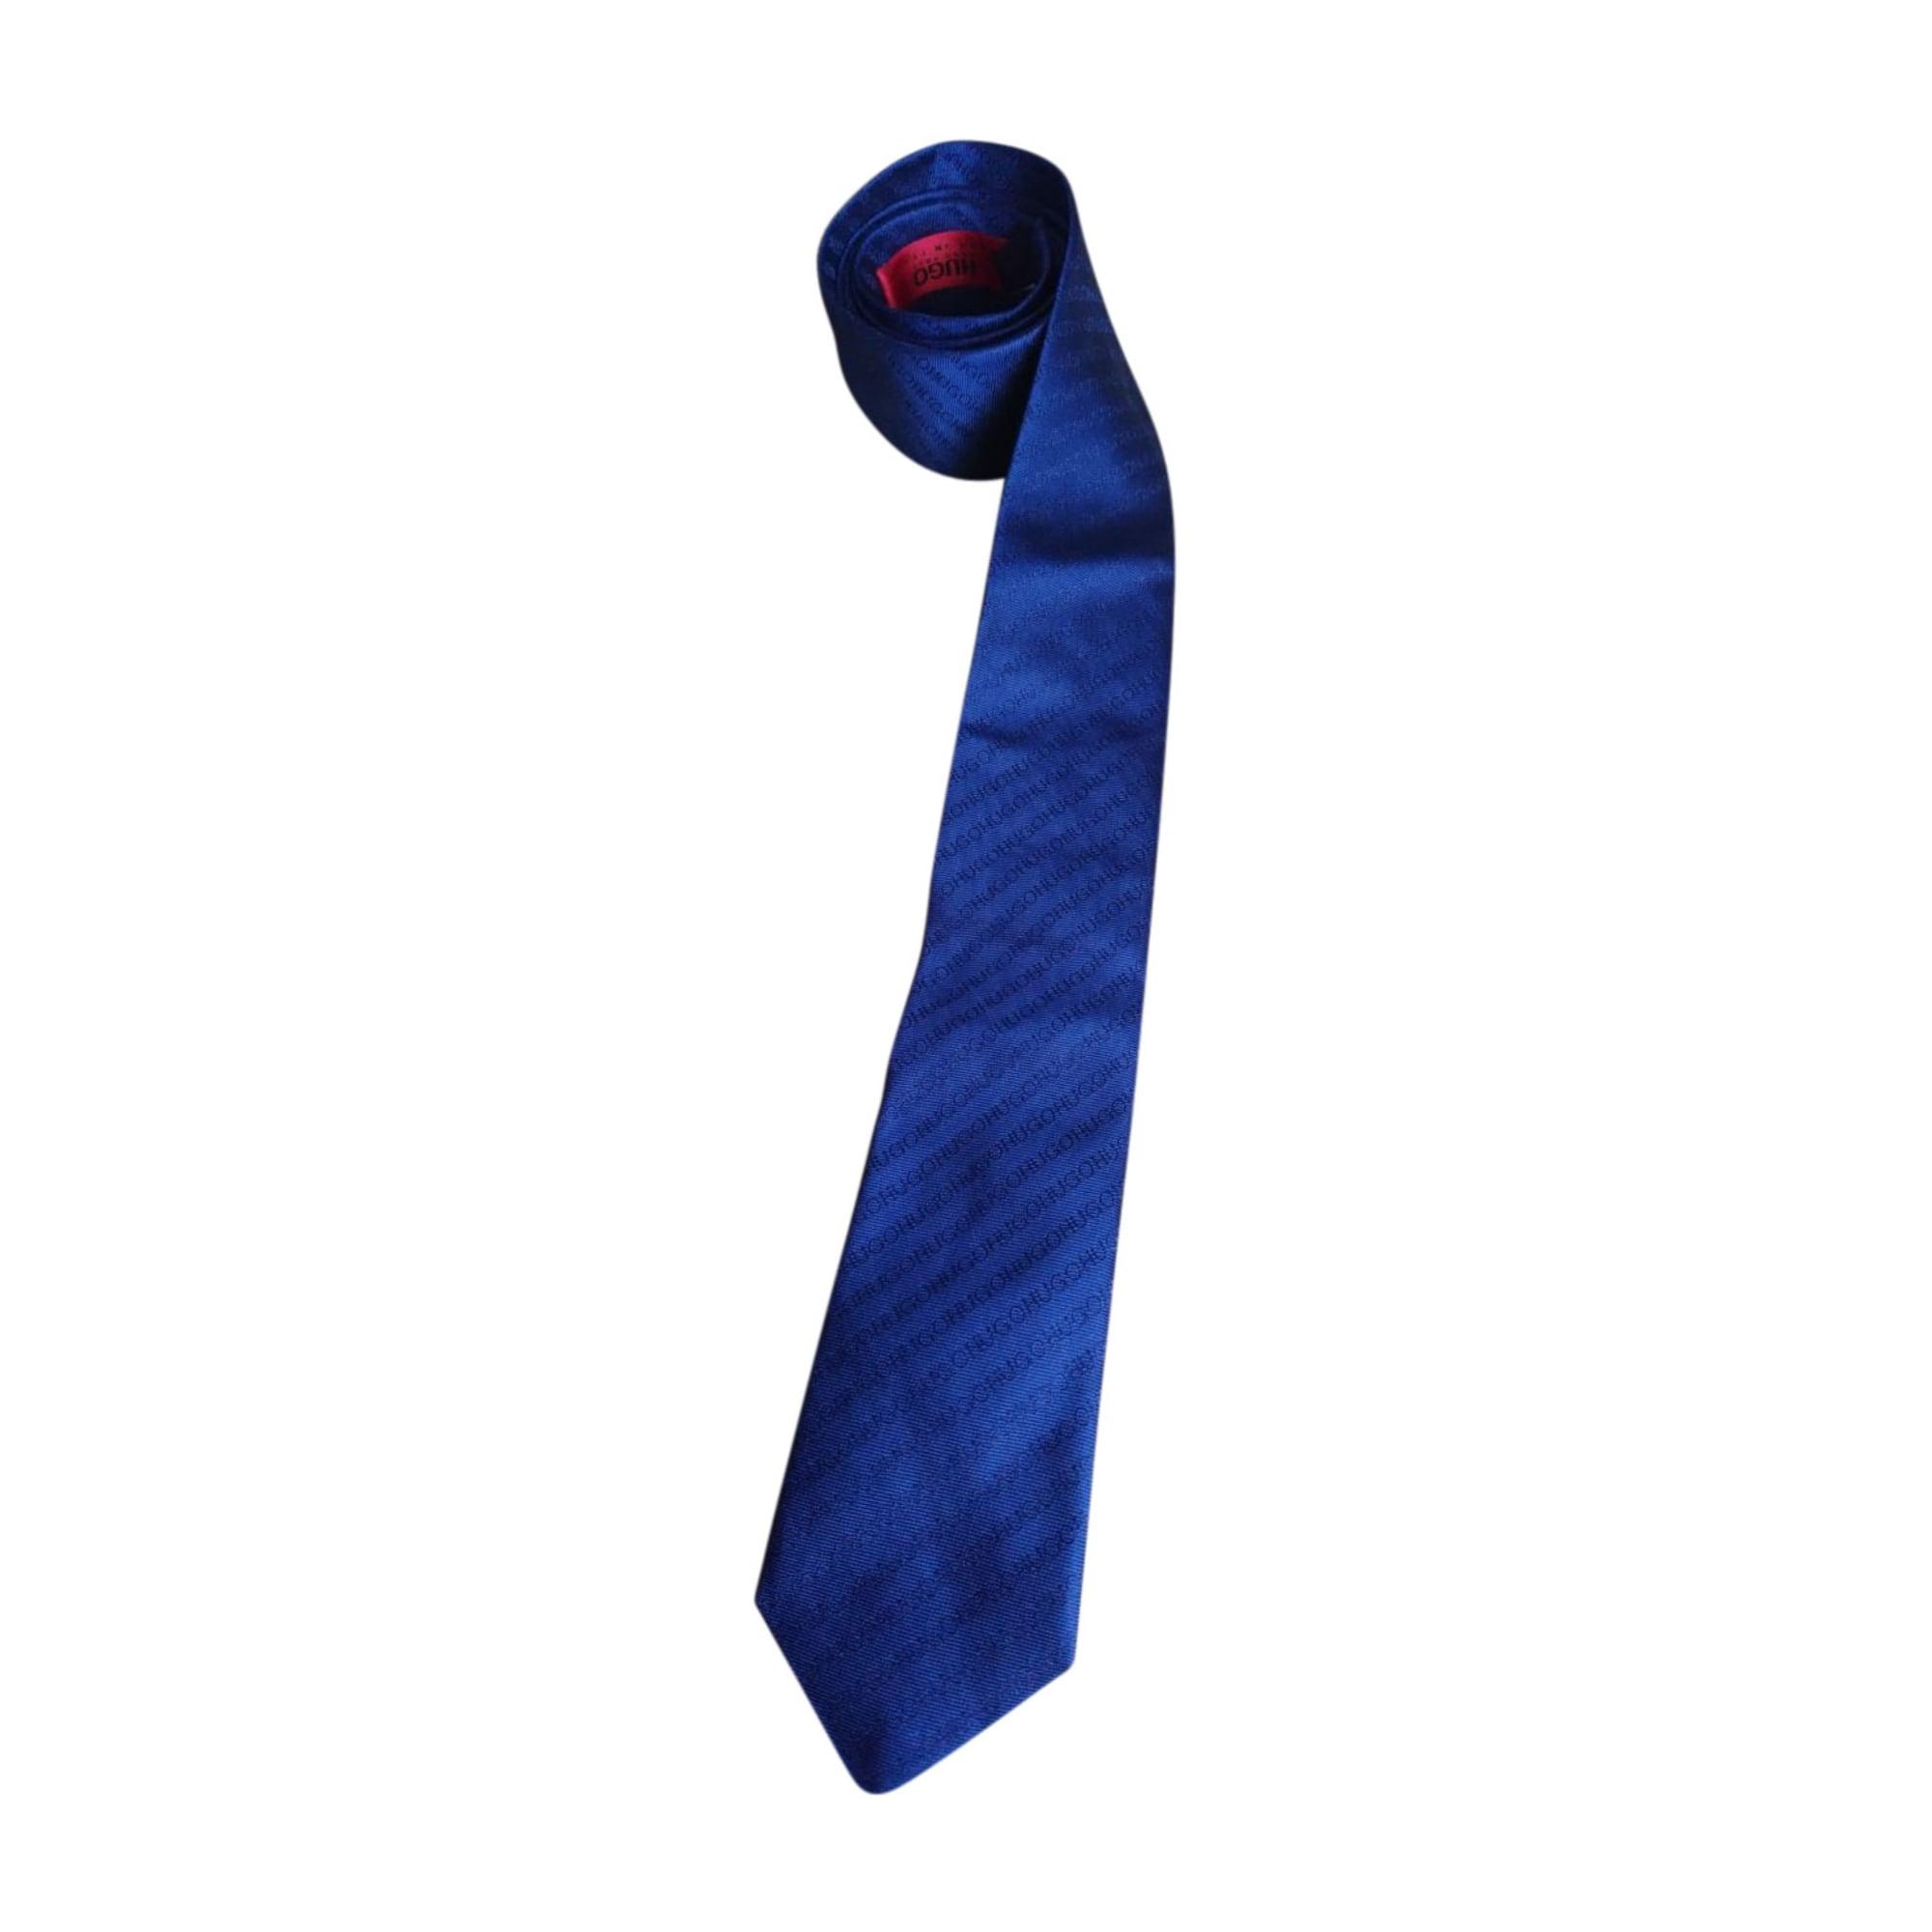 Tie HUGO BOSS Blue, navy, turquoise